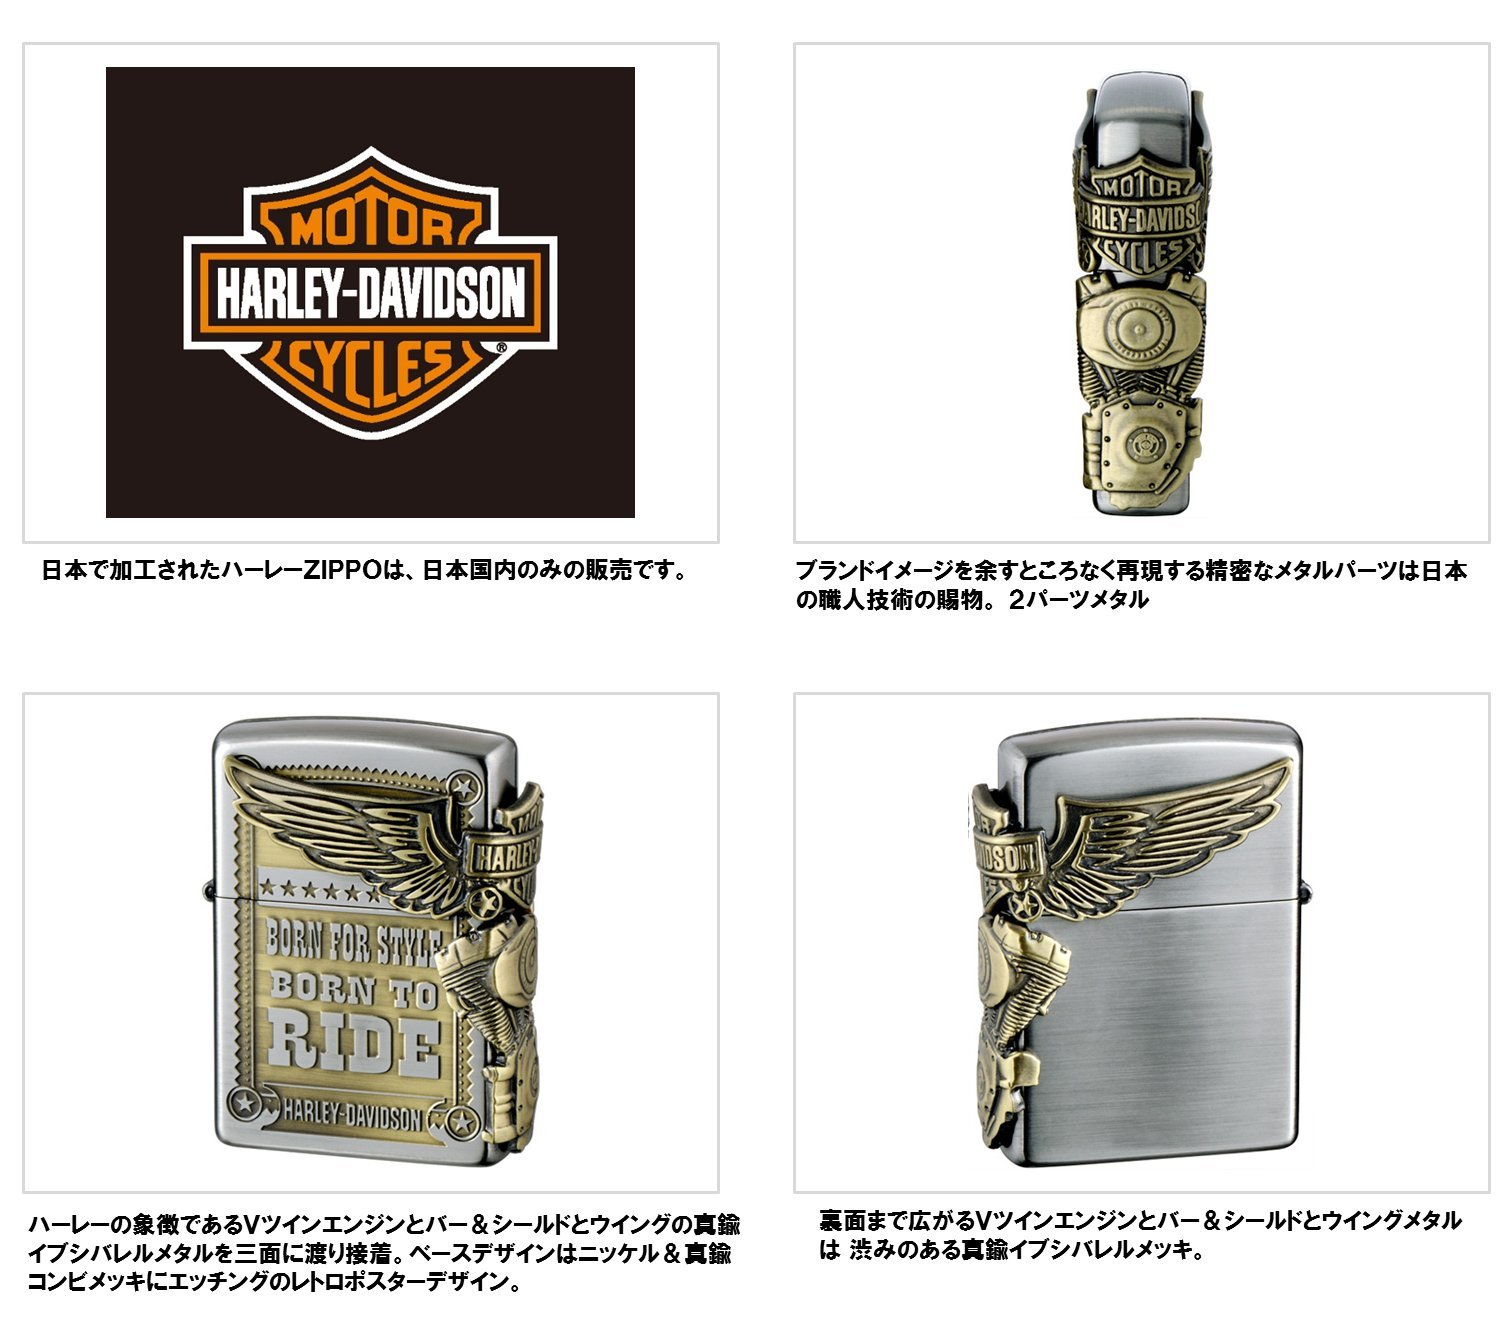 Zippo Harley-davidson Hdp-27